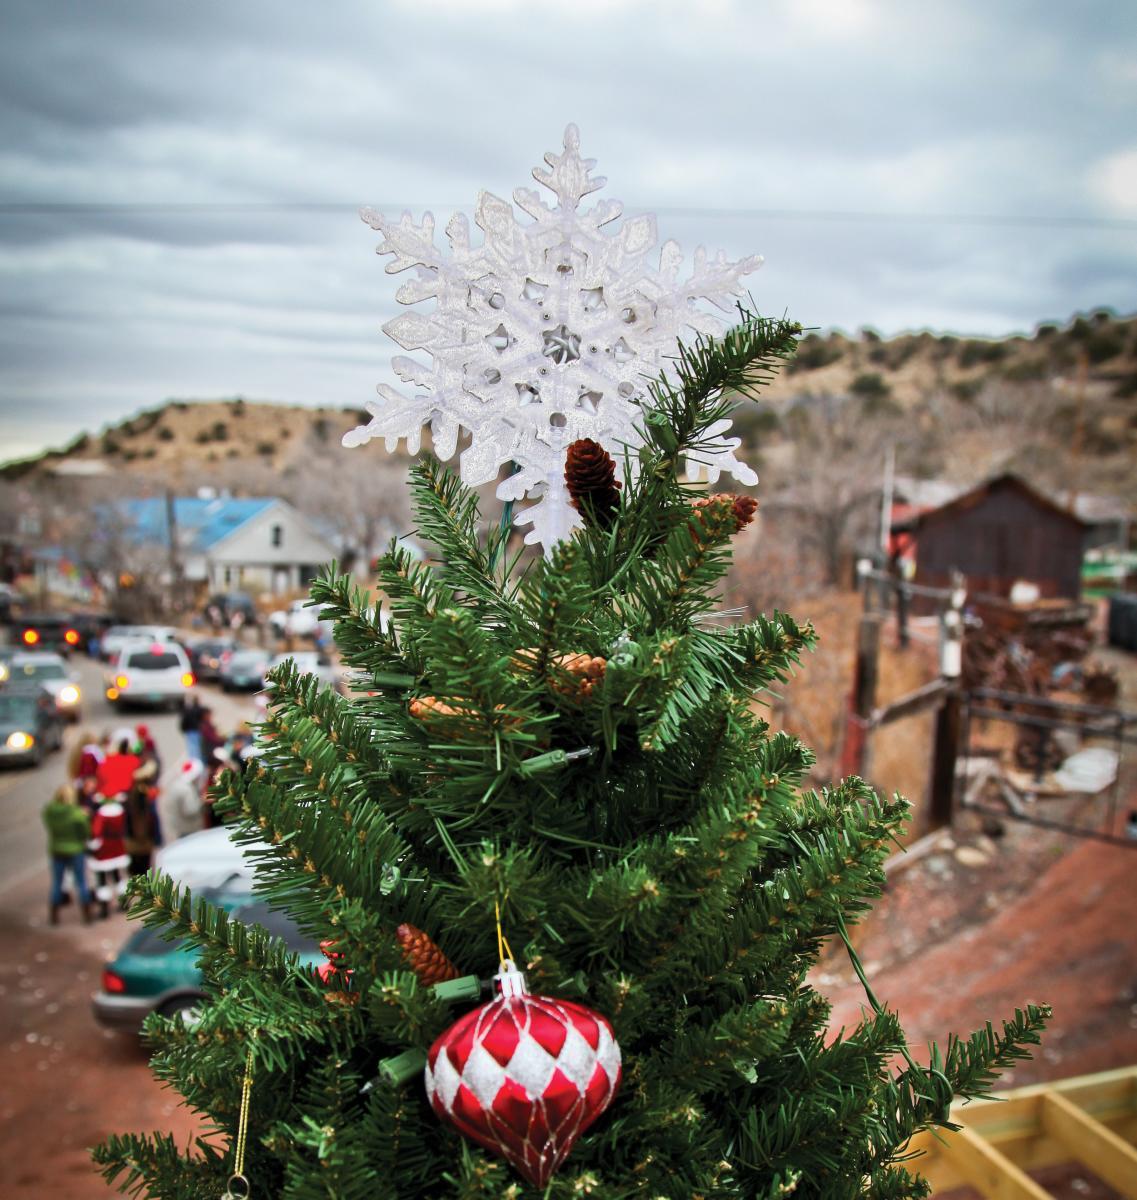 The tree at the Madrid Christmas parade